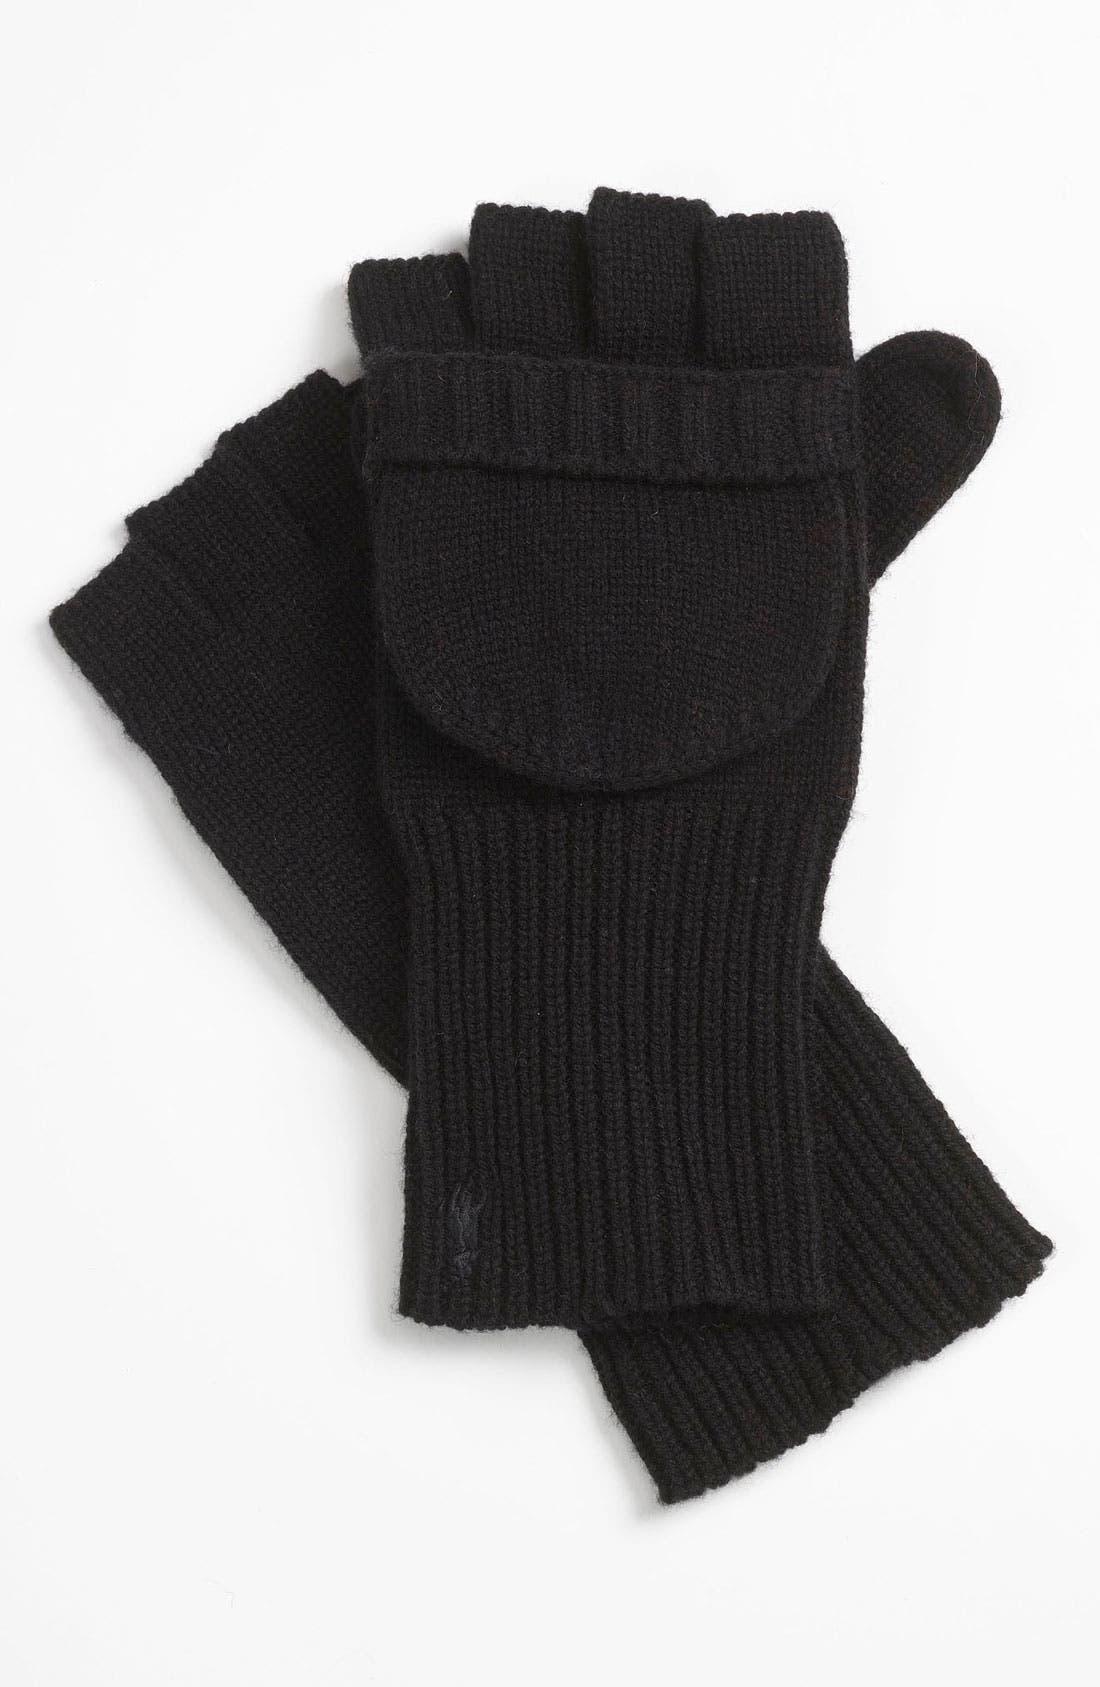 POLO RALPH LAUREN Convertible Gloves, Main, color, 001